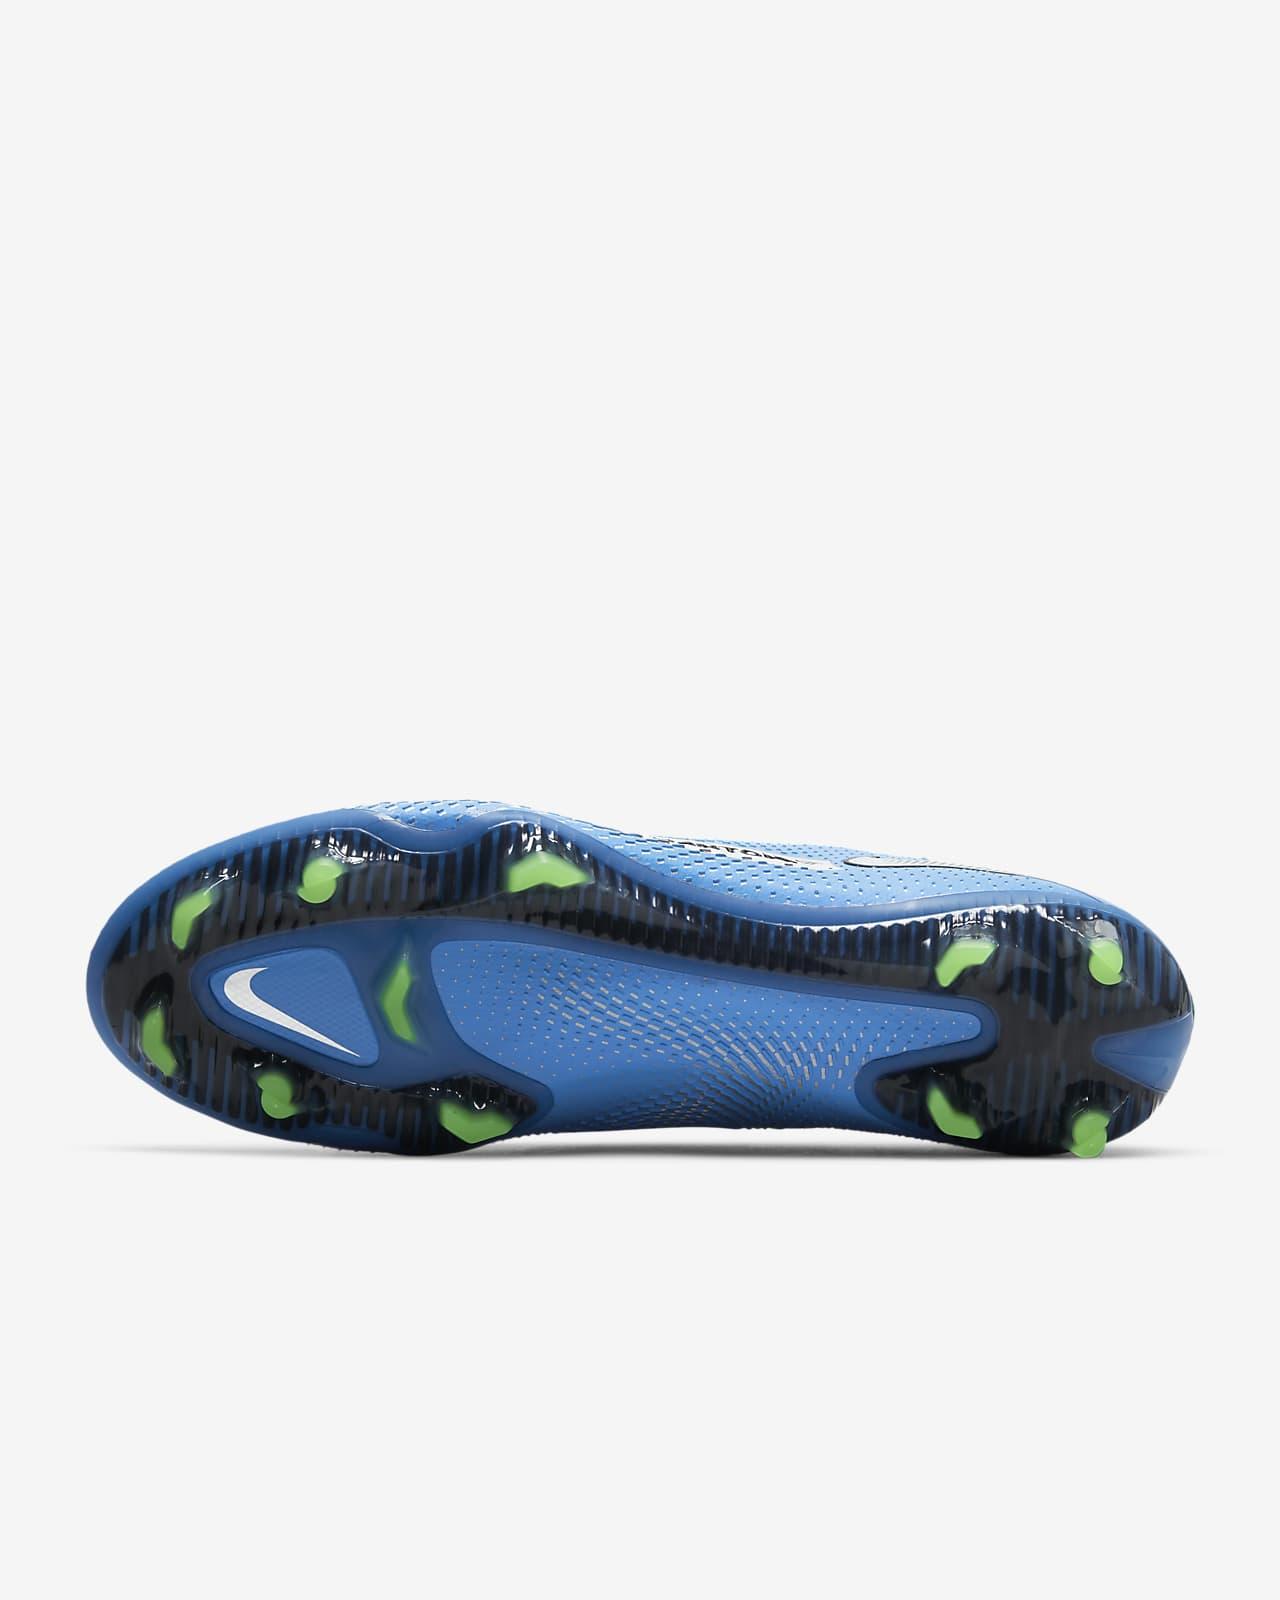 Nike Phantom GT Elite FG Firm-Ground Soccer Cleat